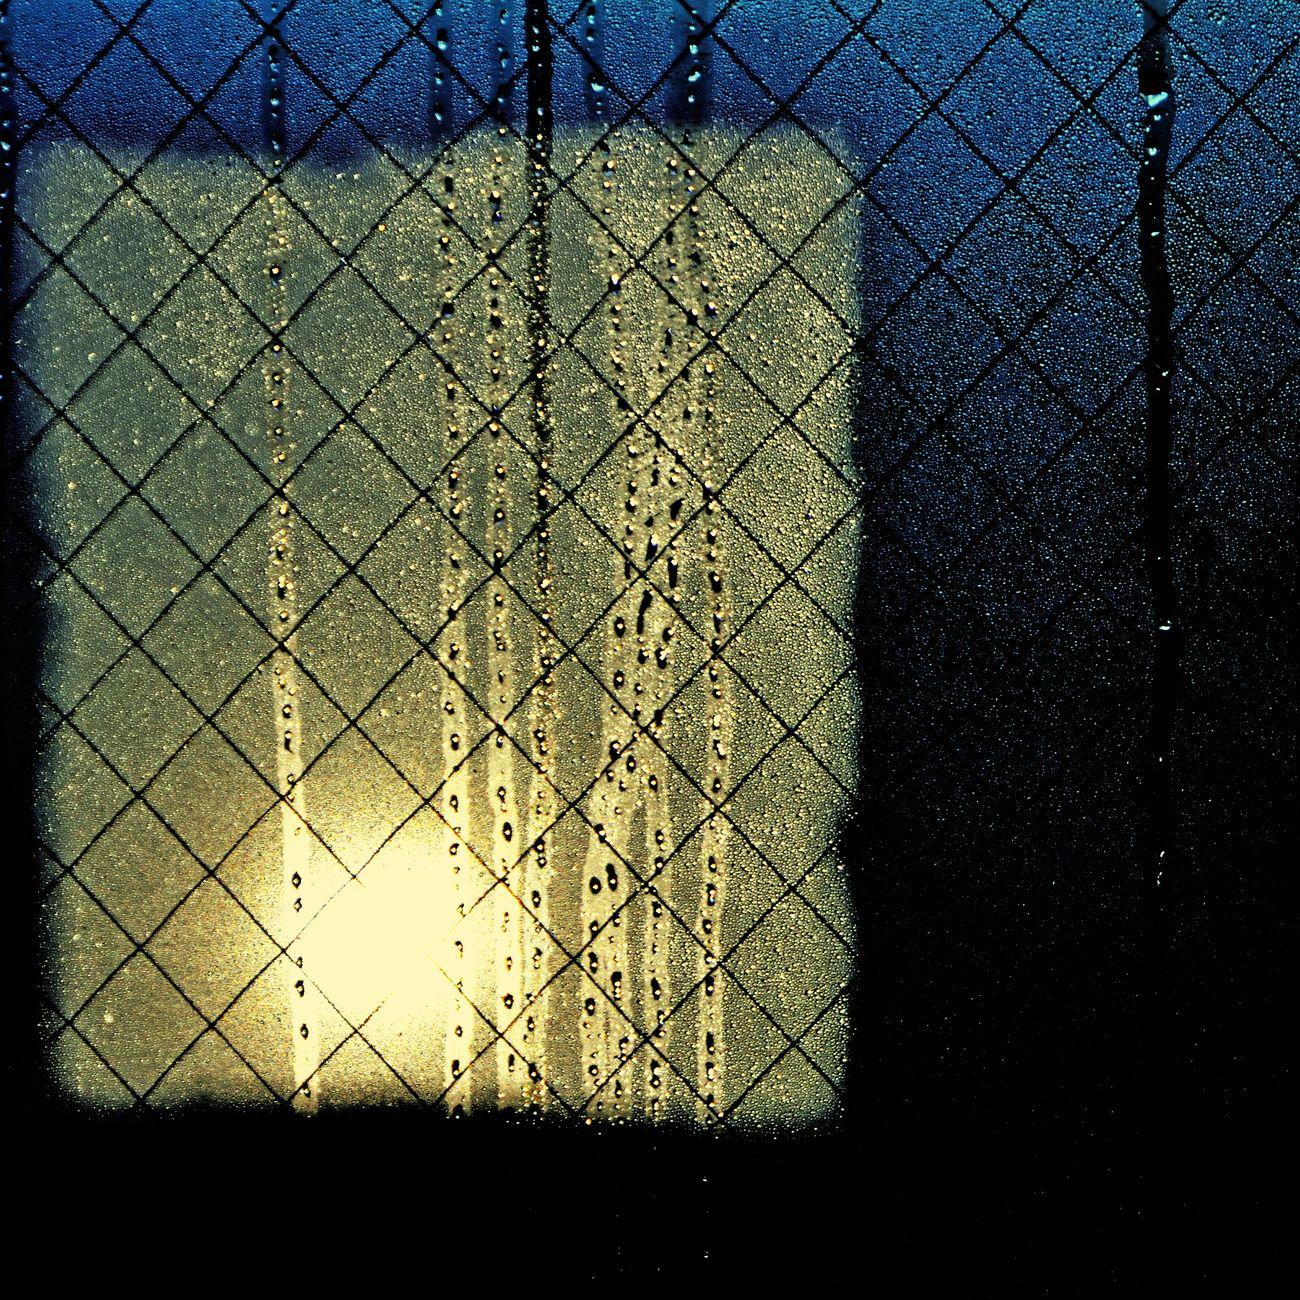 Dew Condensation Night Lights Window Goodnight